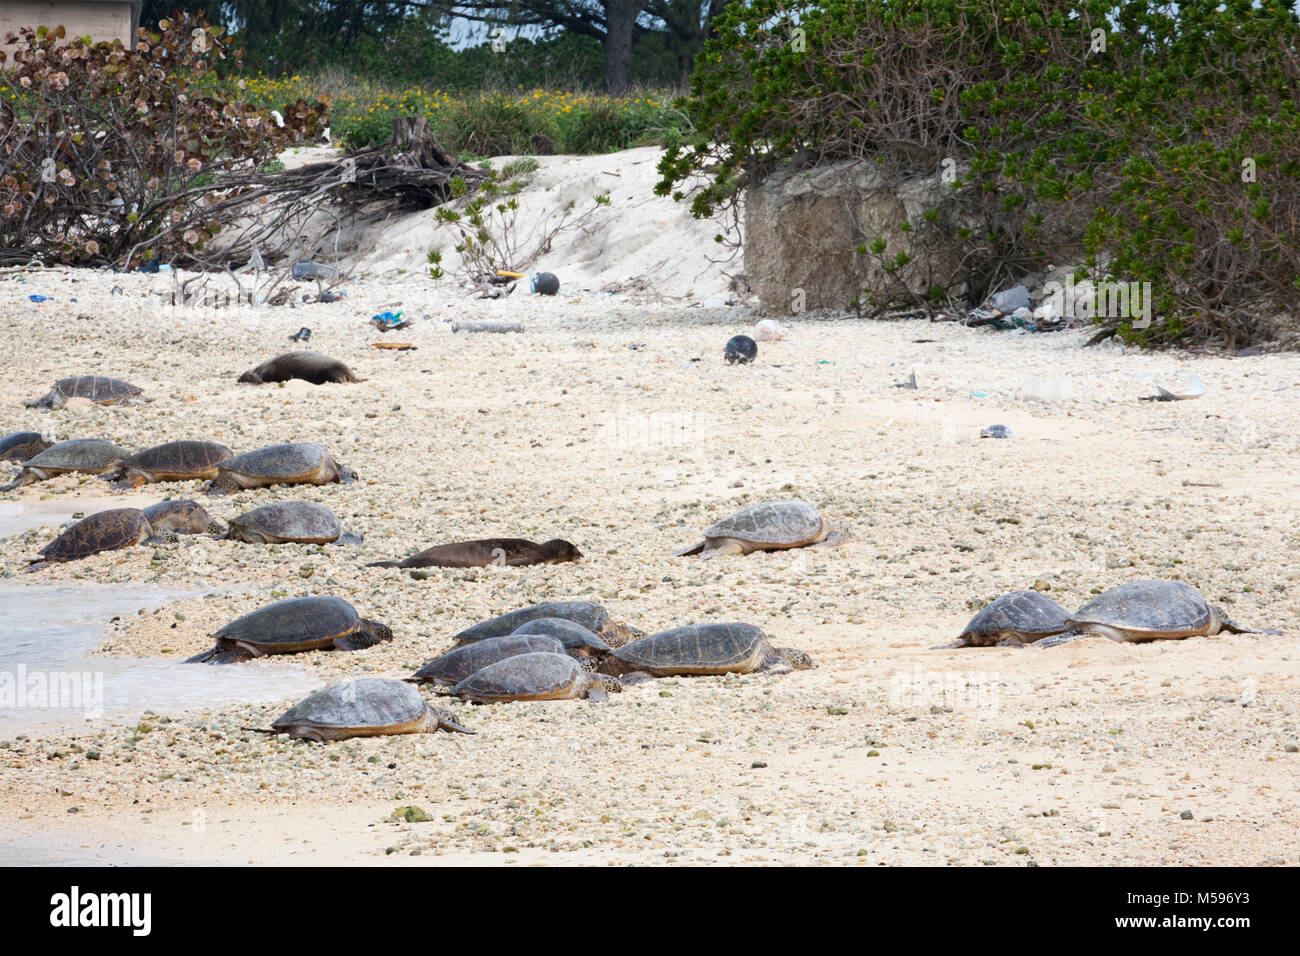 Sea Turtles (Chelonia mynas) and Hawaiian Monk Seals (Neomonachus schauinslandi) basking on a North Pacific island - Stock Image